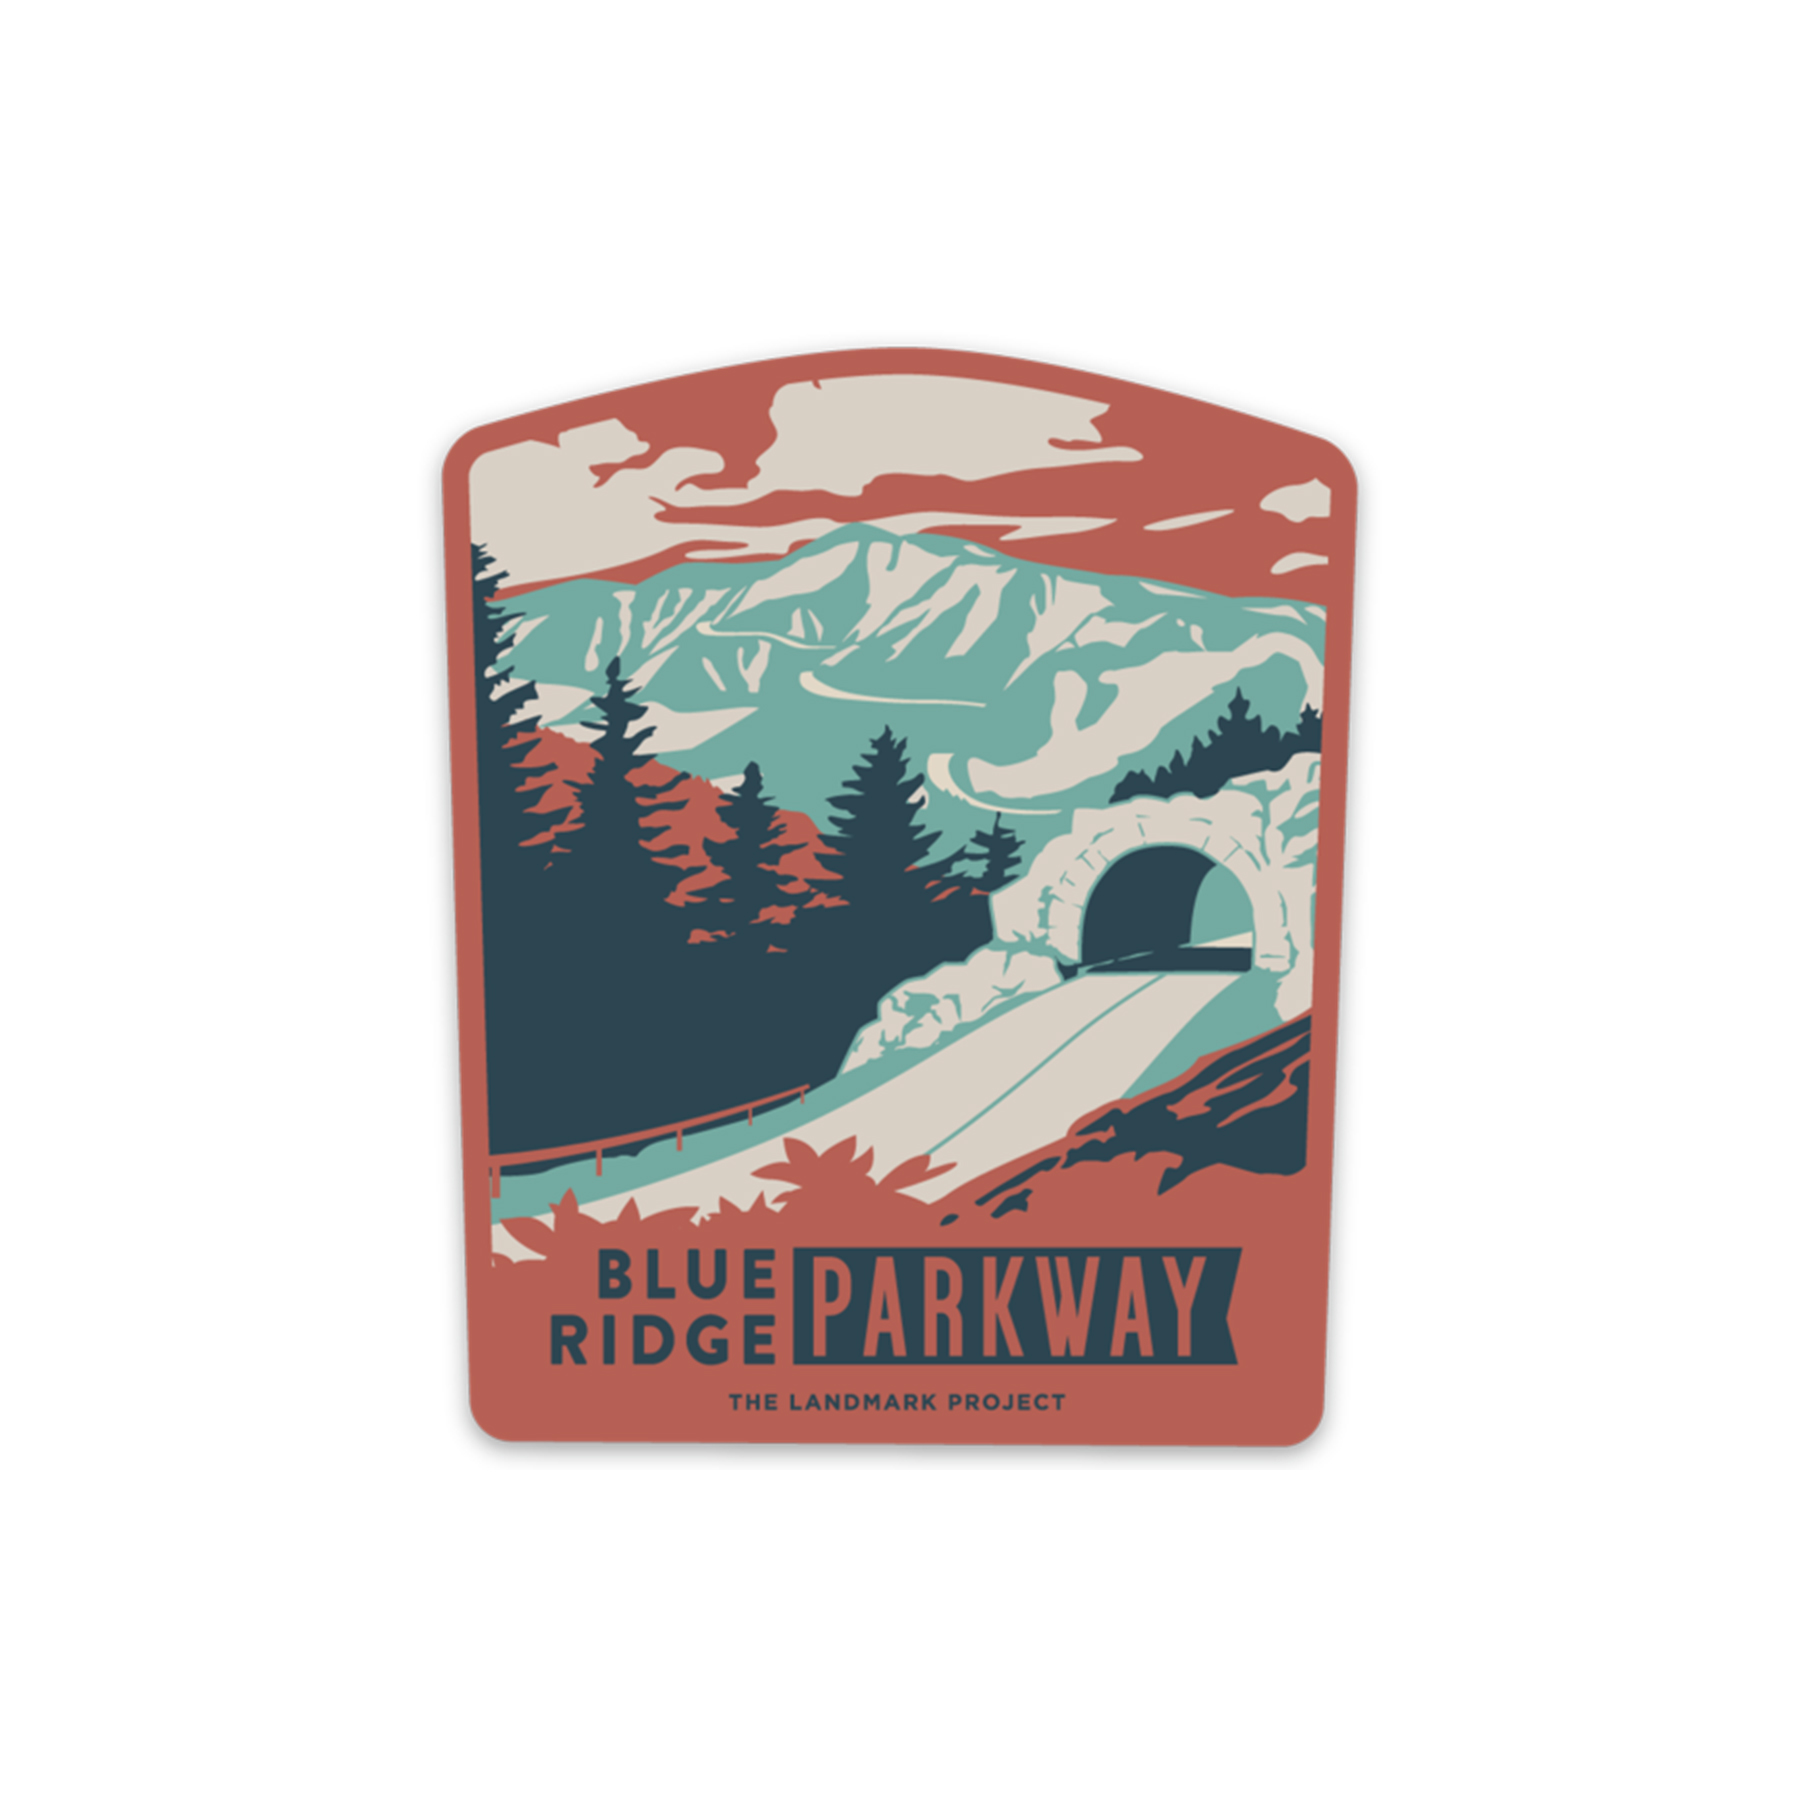 blue-ridge-parkway-sticker-2.jpg